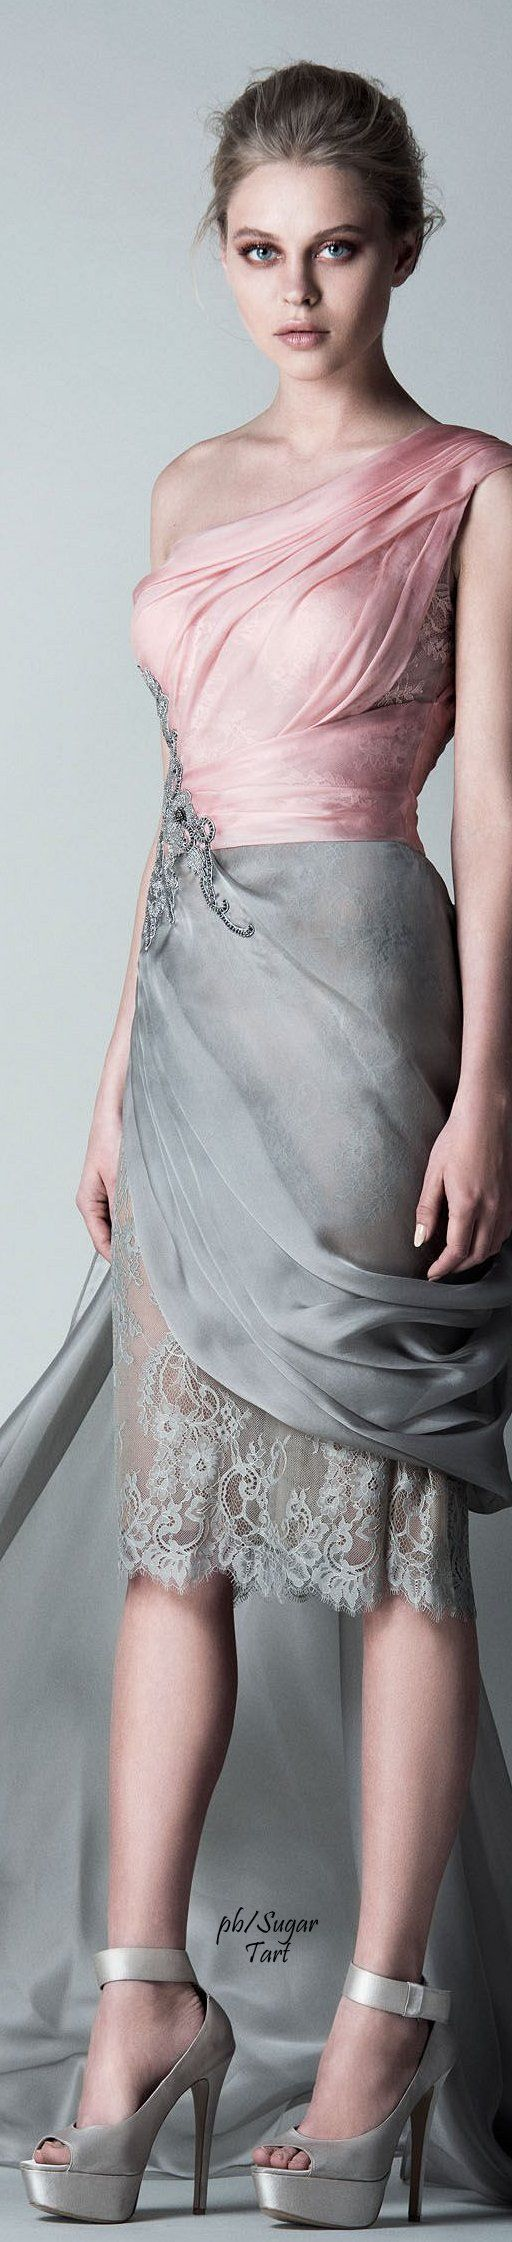 Saiid Kobeissy Pre-Fall 2015-16 Couture jαɢlαdy